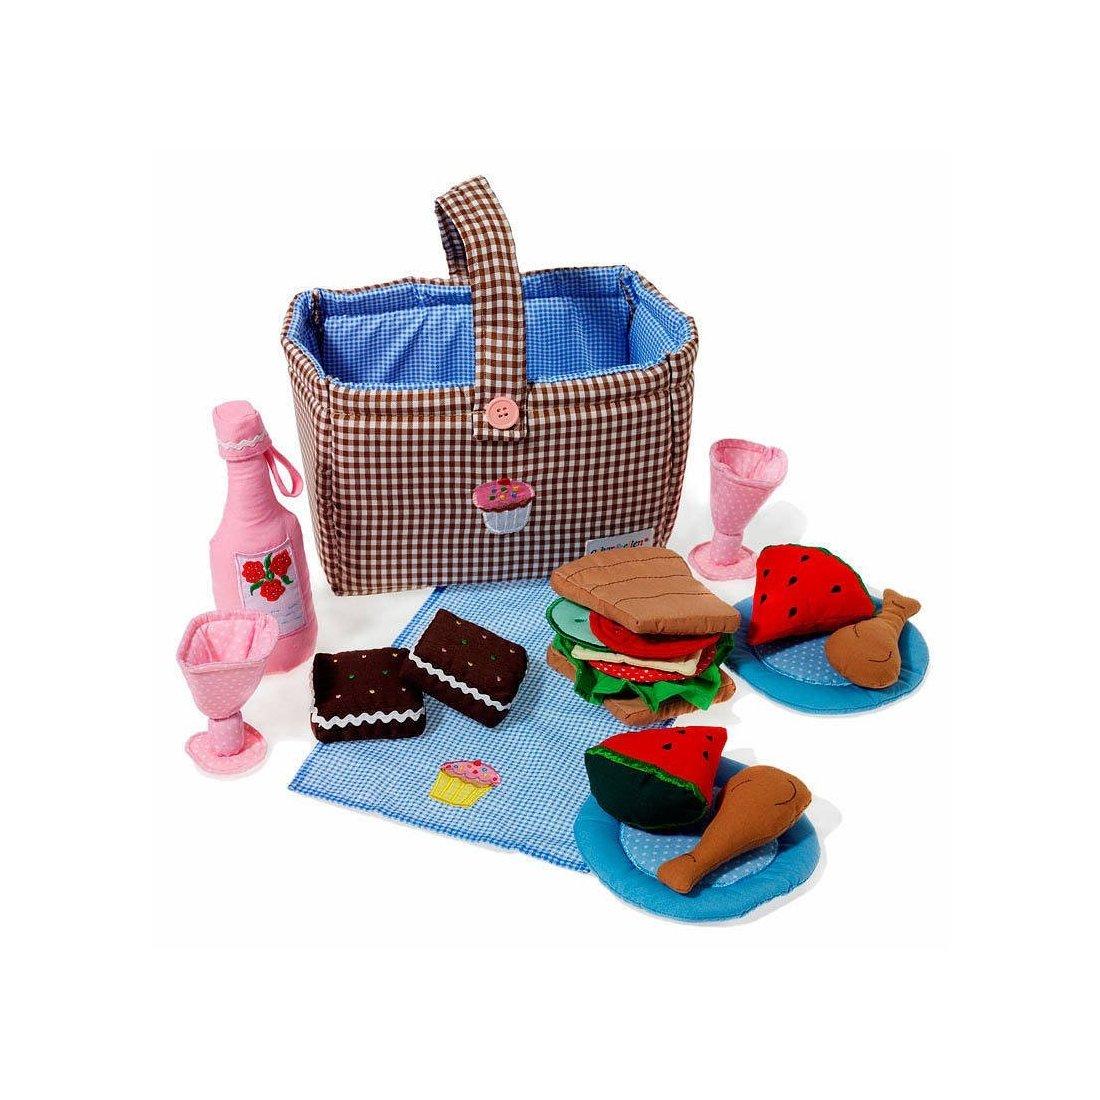 Juguete para ni os 39 cesta de picnic 39 tu bebebox - Cesta para guardar juguetes ...